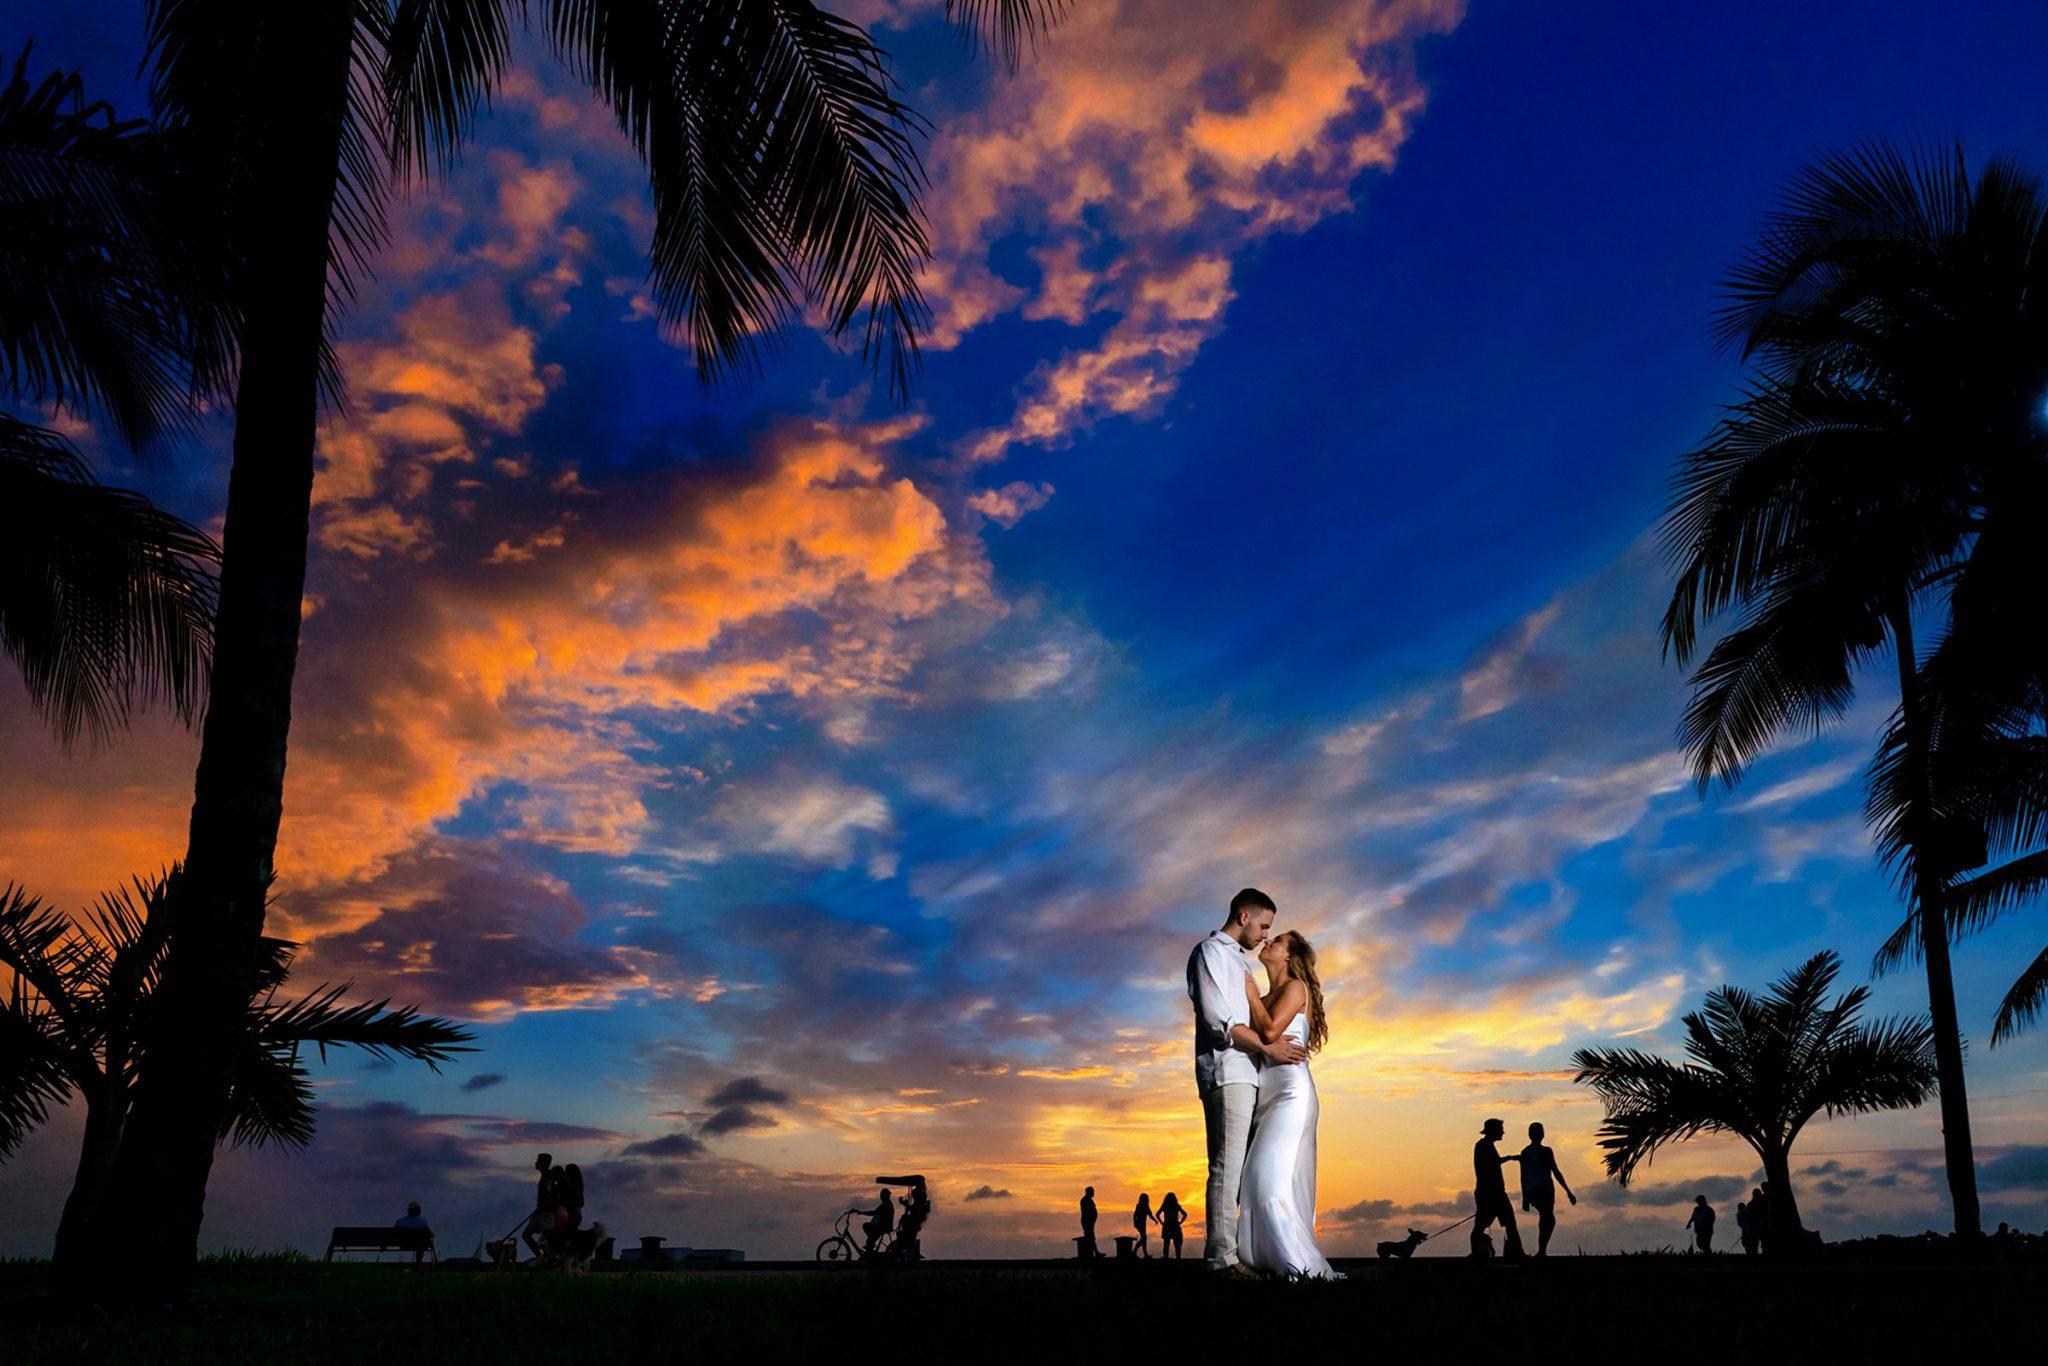 wedding couple at sunset at Truman Annex park key west florida